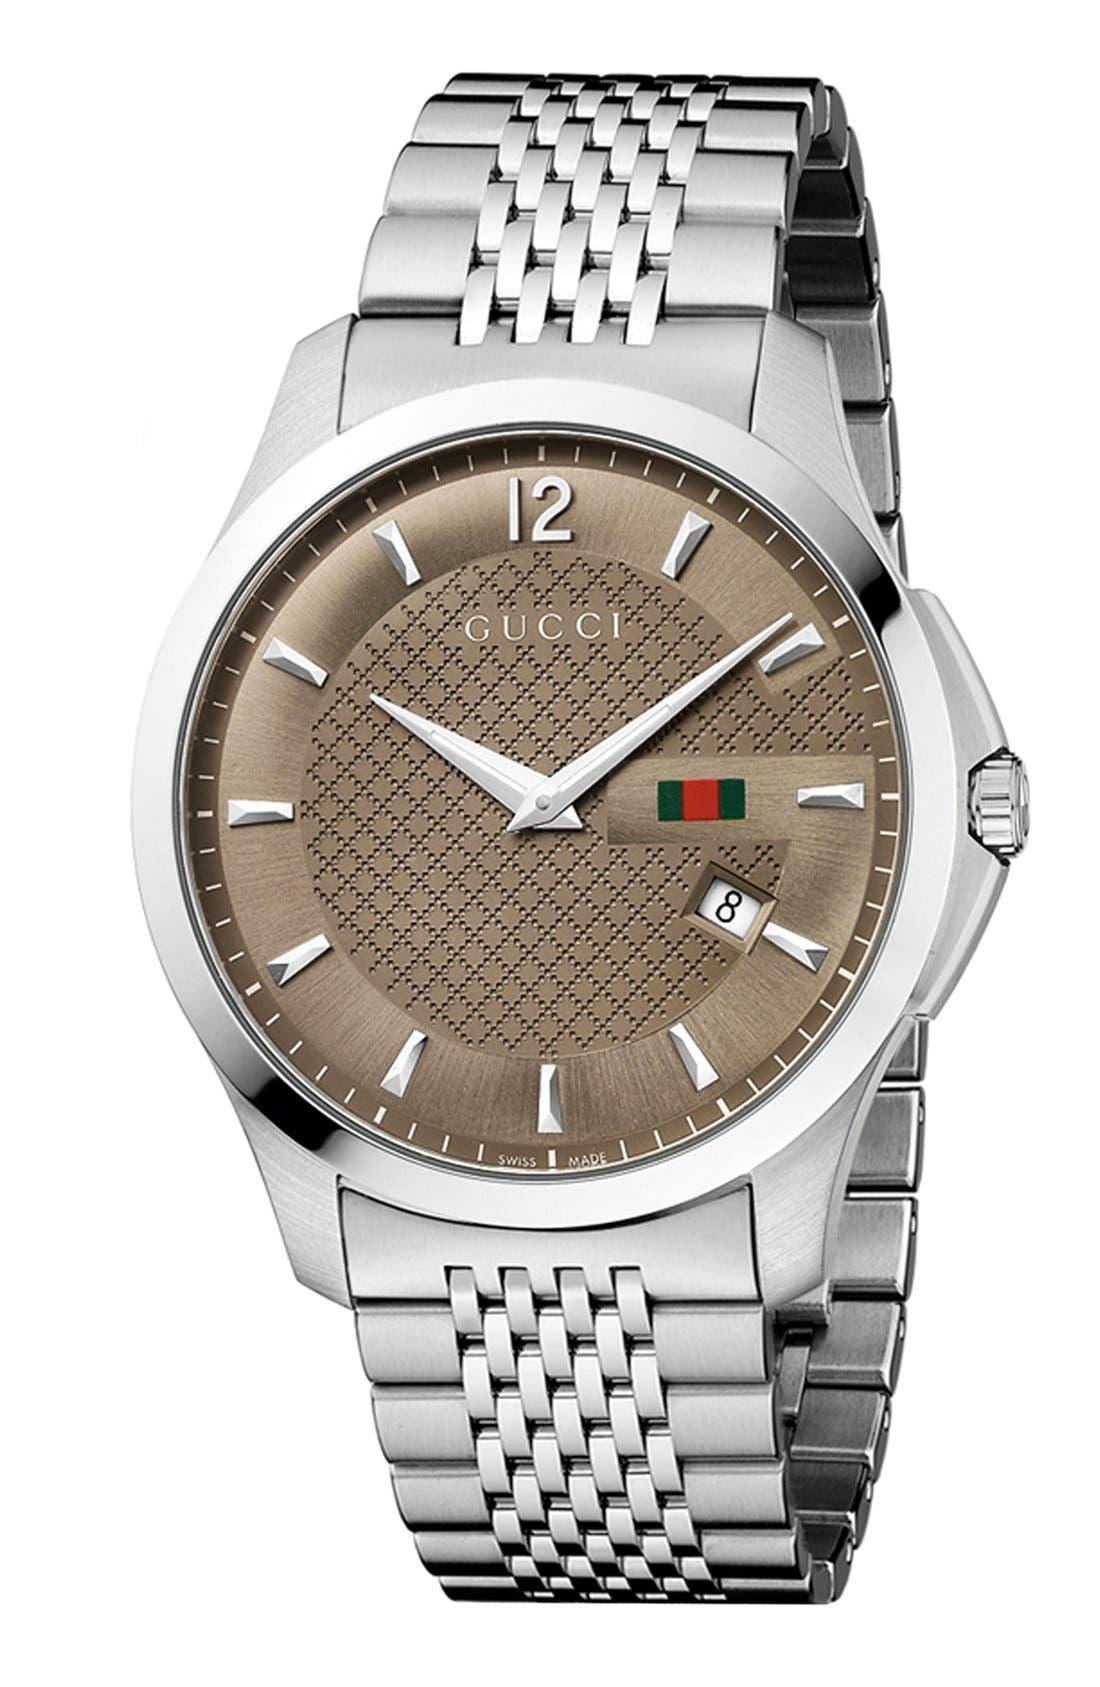 Main Image - Gucci 'G-Timeless' Bracelet Watch, 40mm